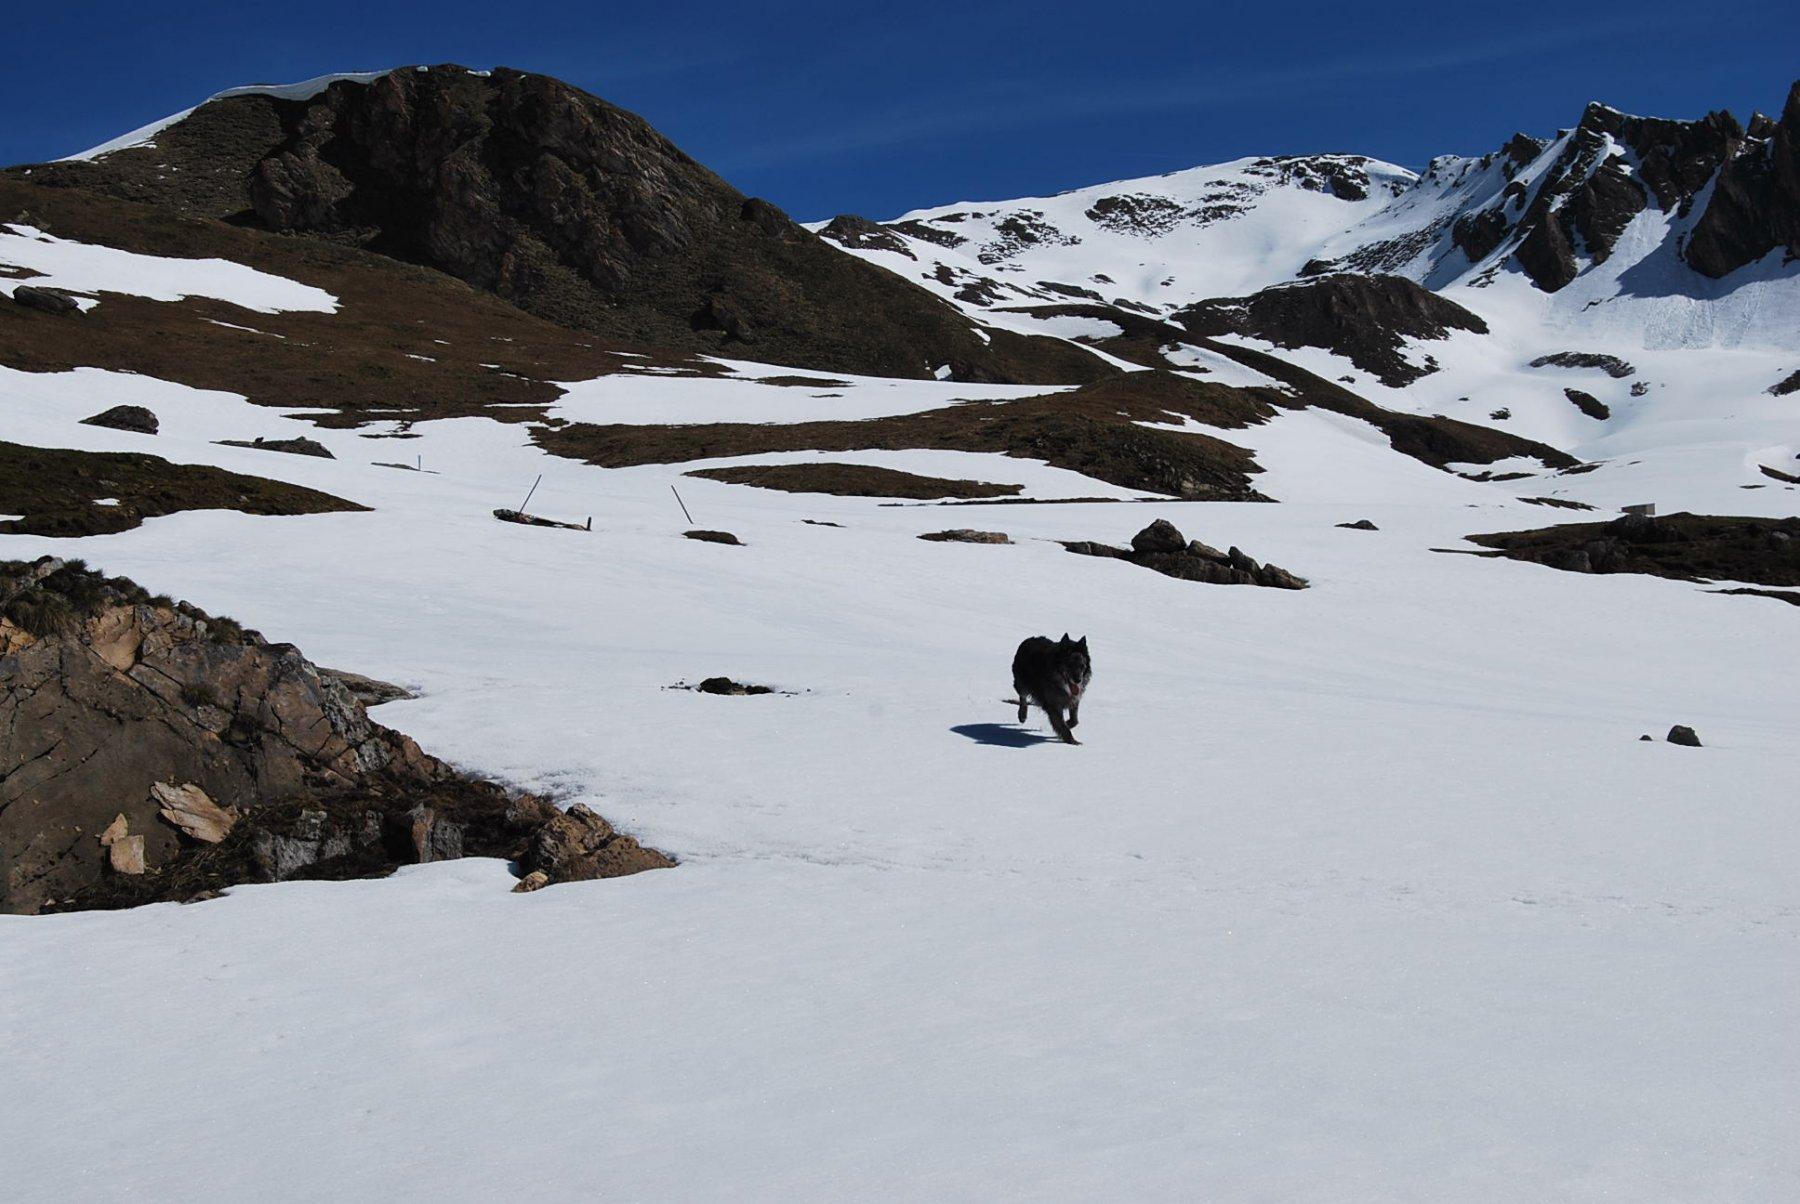 A Chavannes d'en haut dove comincia la neve continua